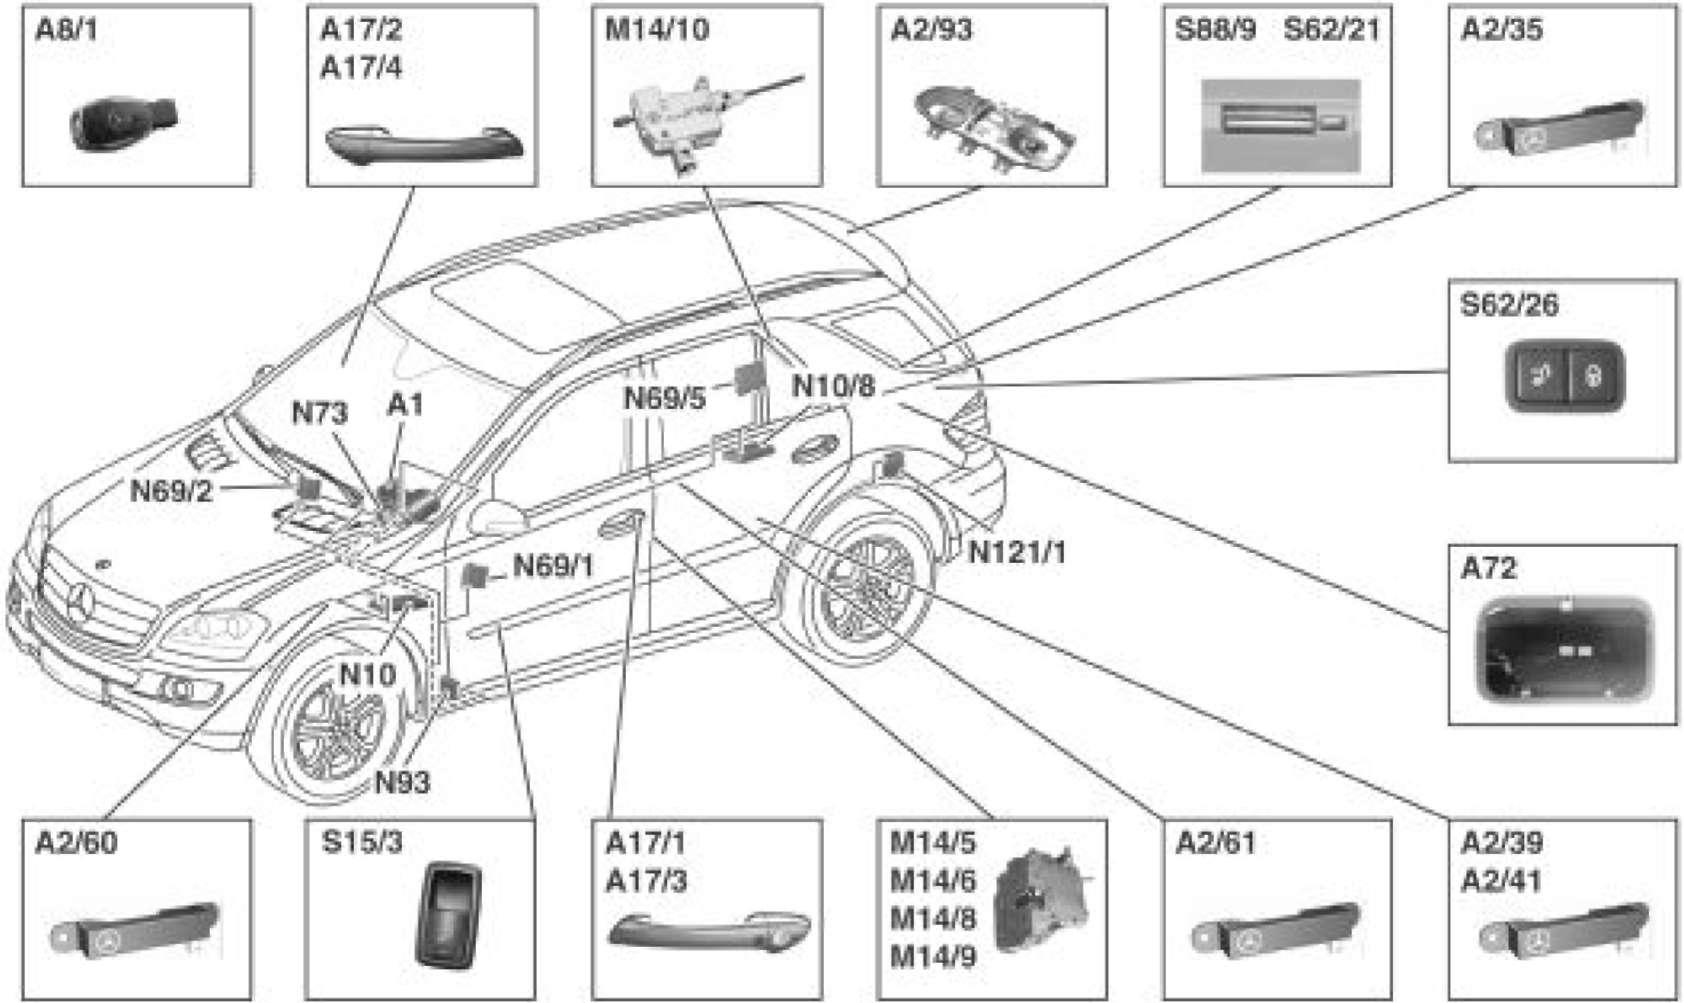 3.9 Keyless Go (KG) Mercedes-Benz W164 (ML Class)